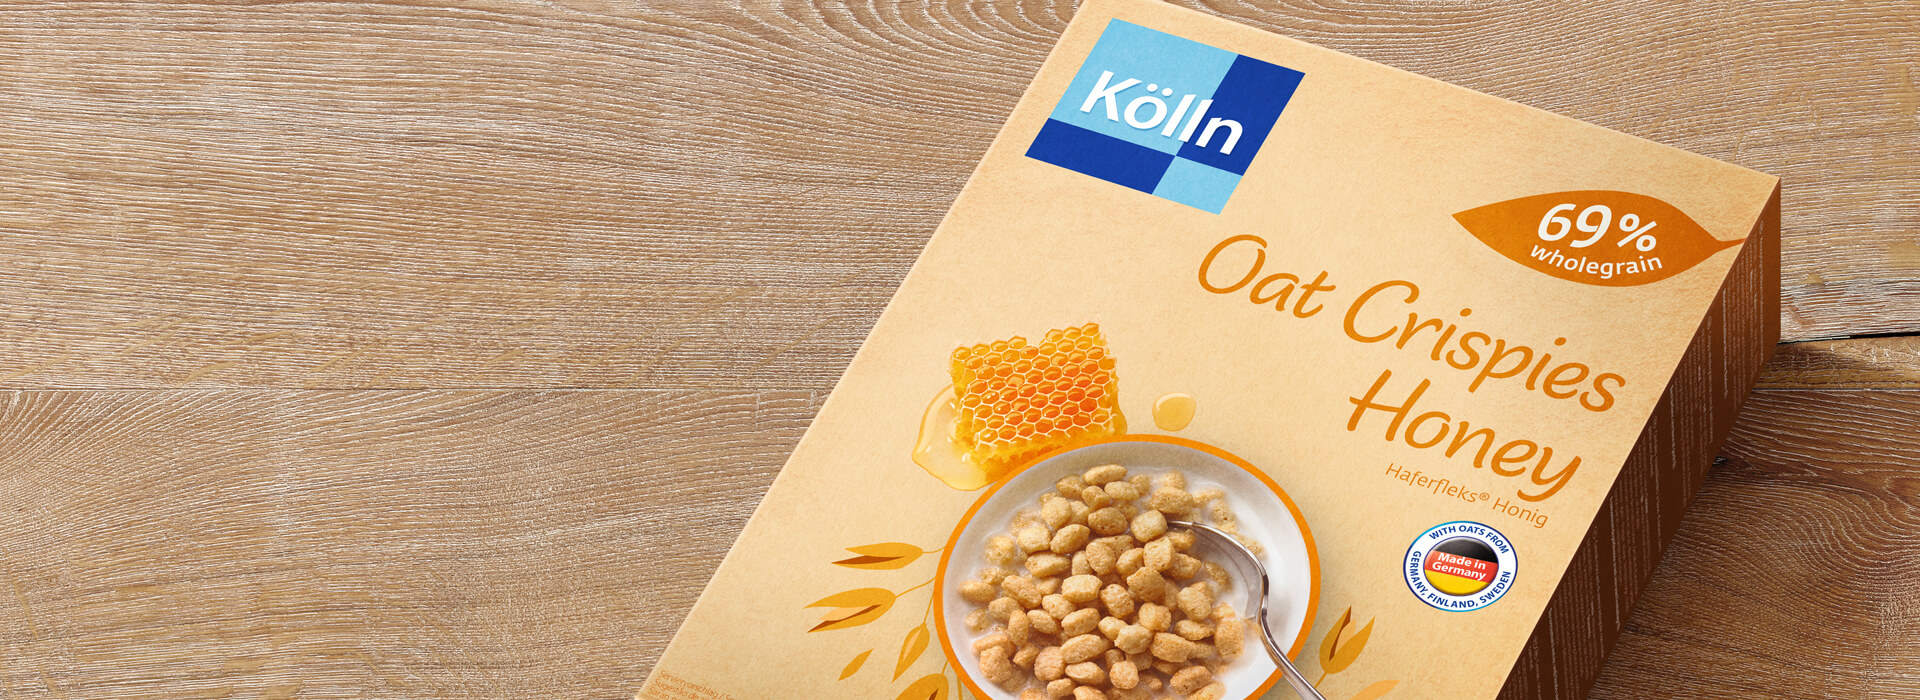 Koelln Oat Crispies Honey Pack on Table